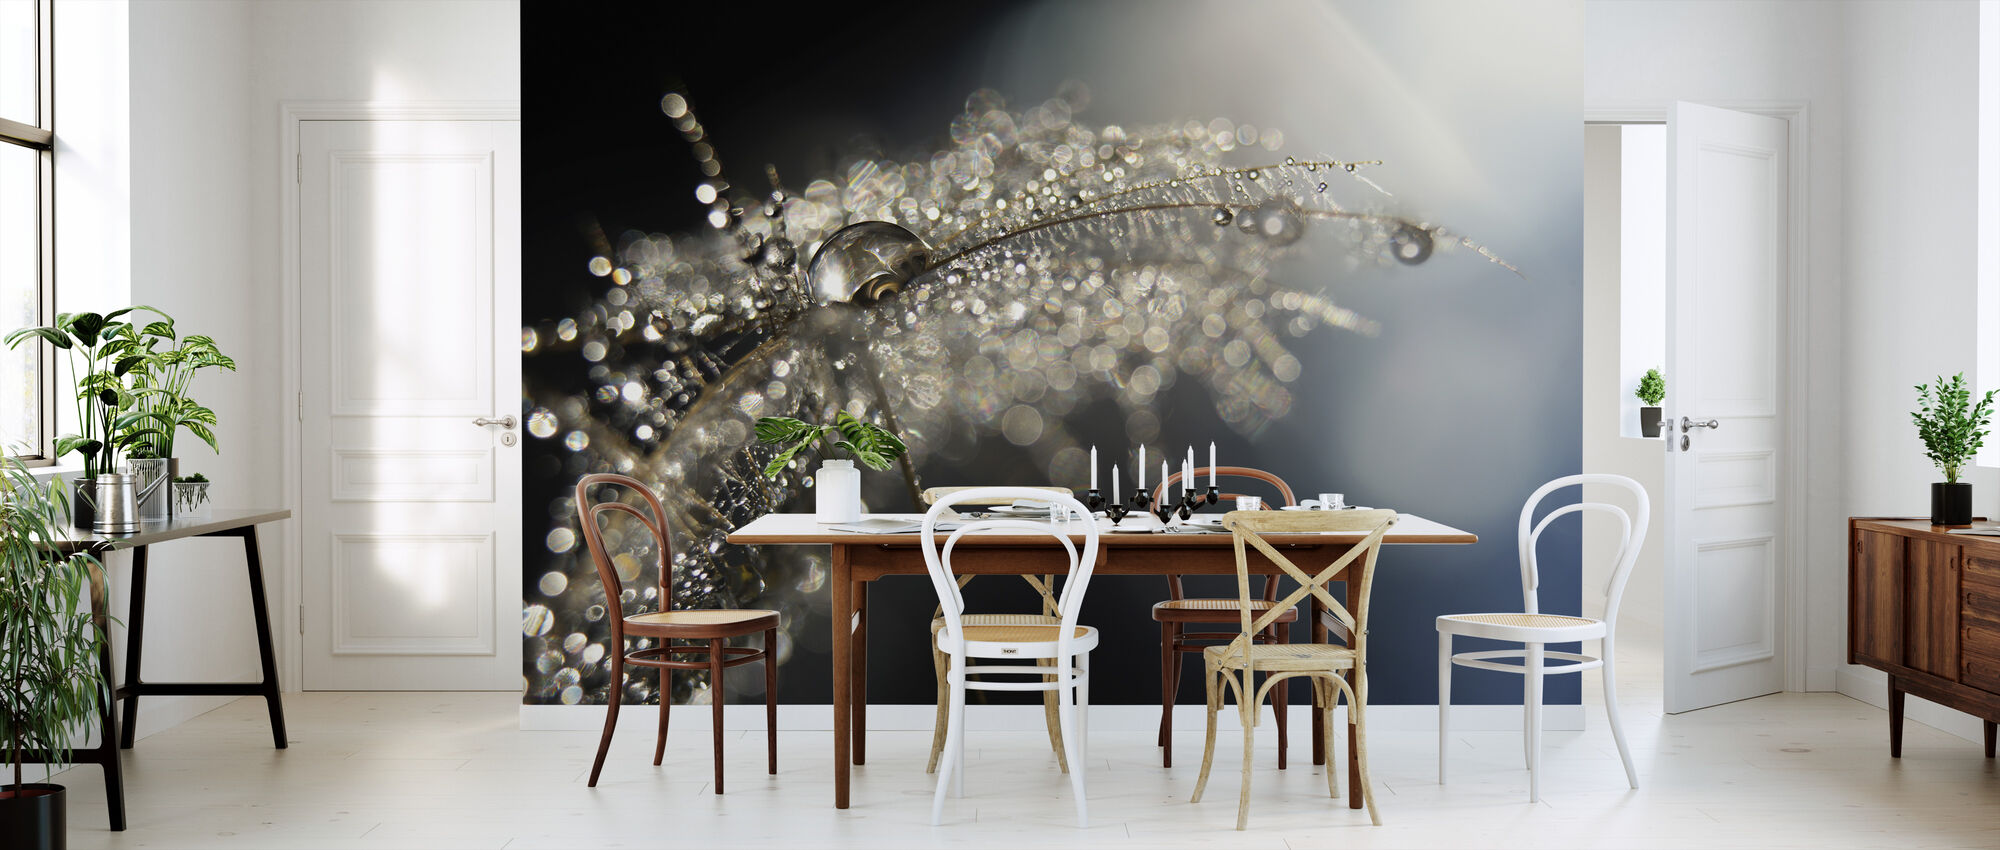 Reflection Explotion - Wallpaper - Kitchen